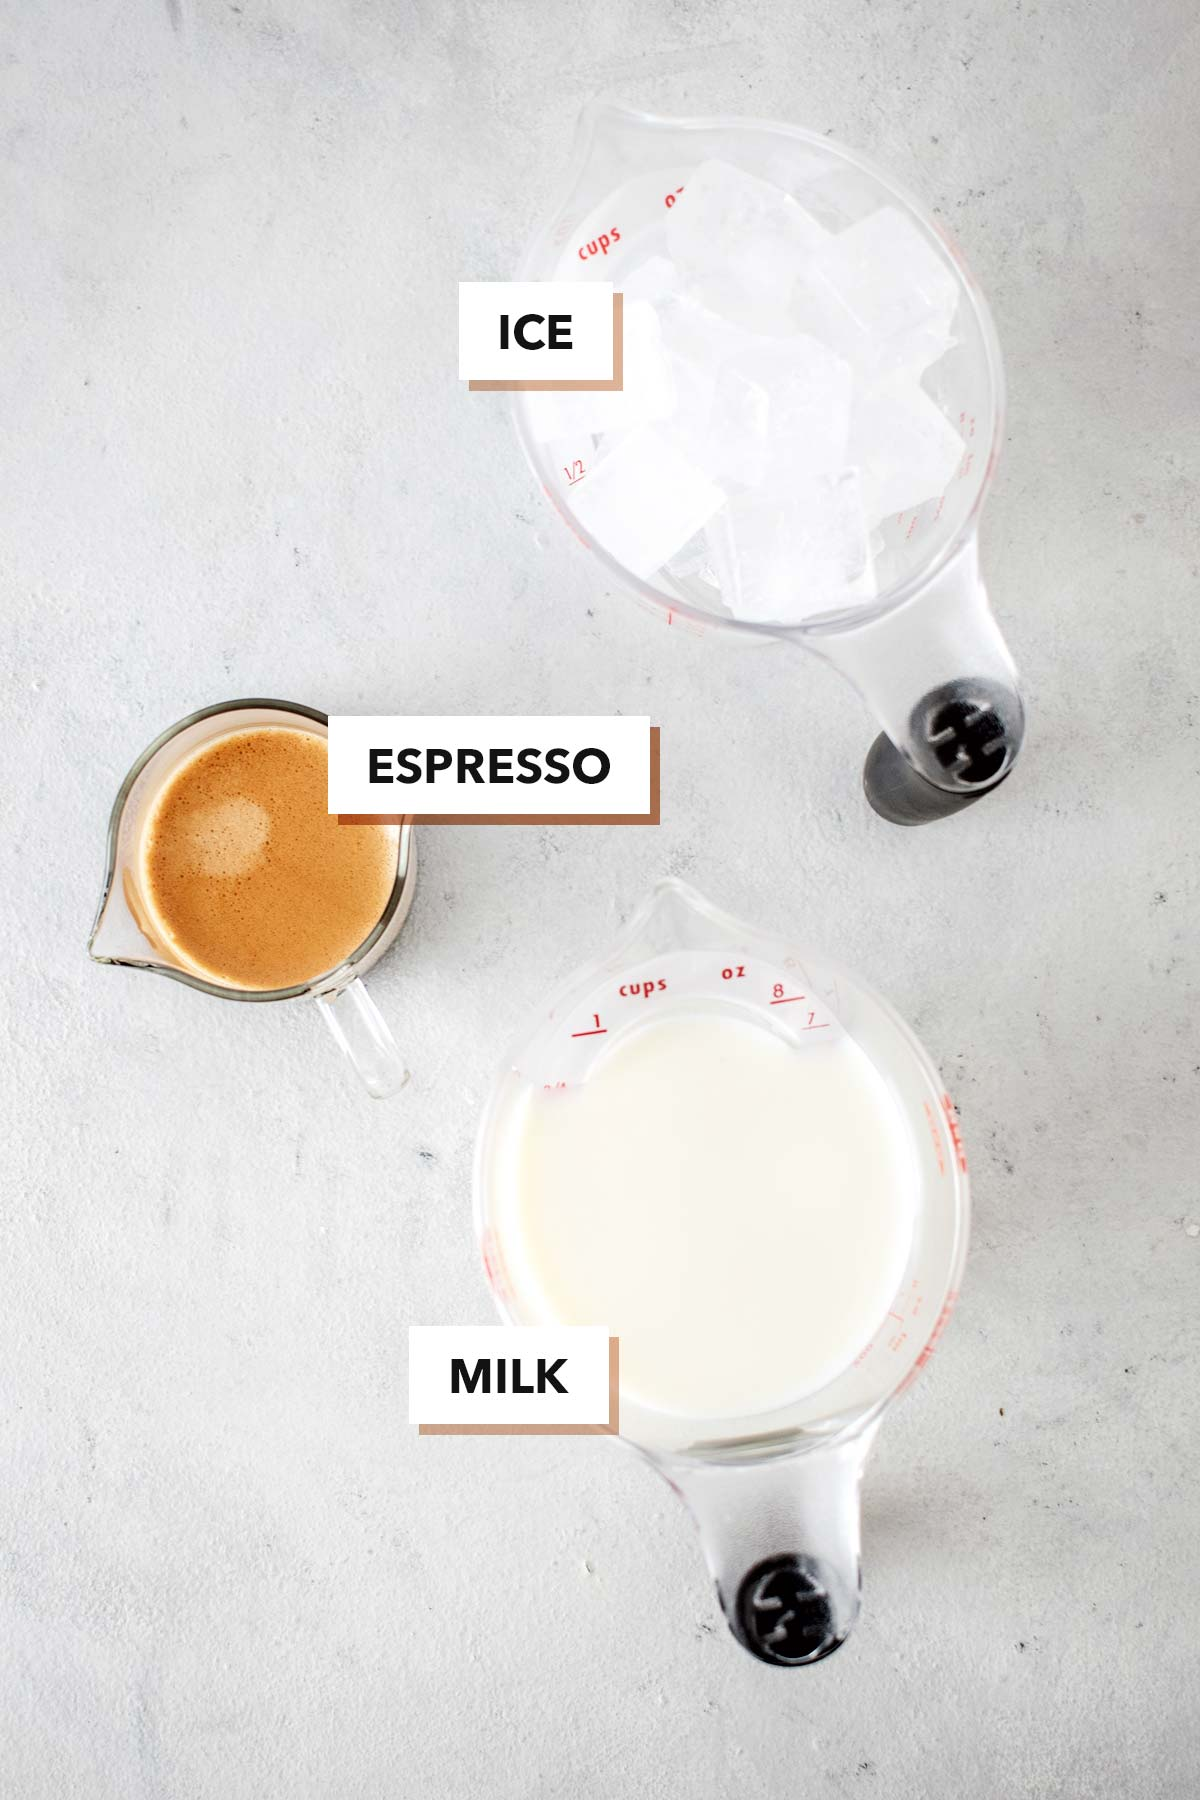 Iced Latte ingredients.